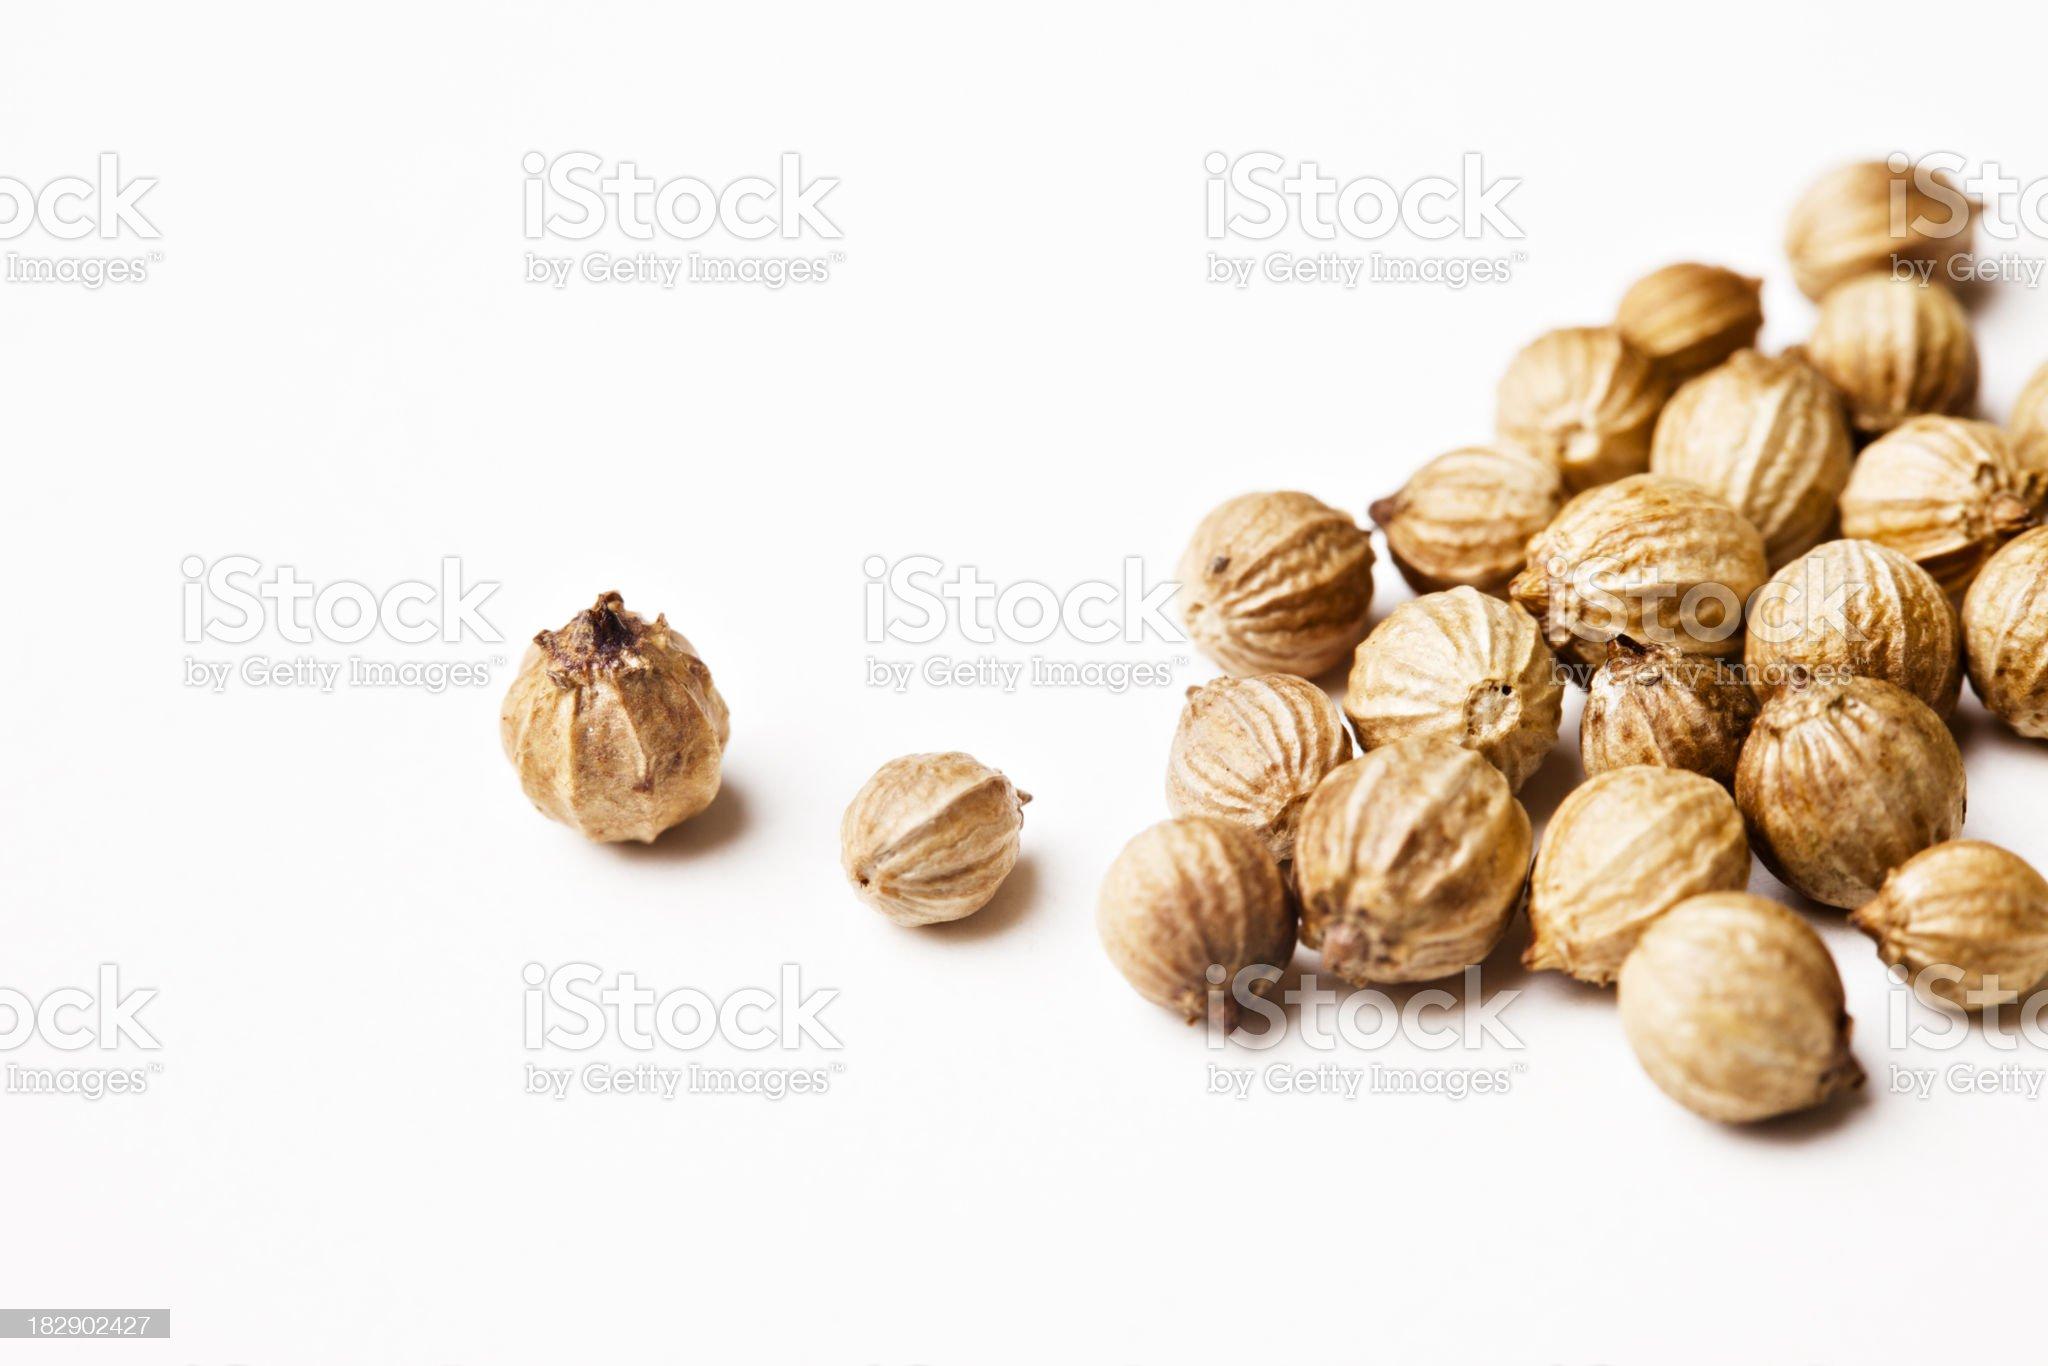 Coriander seeds close-up royalty-free stock photo